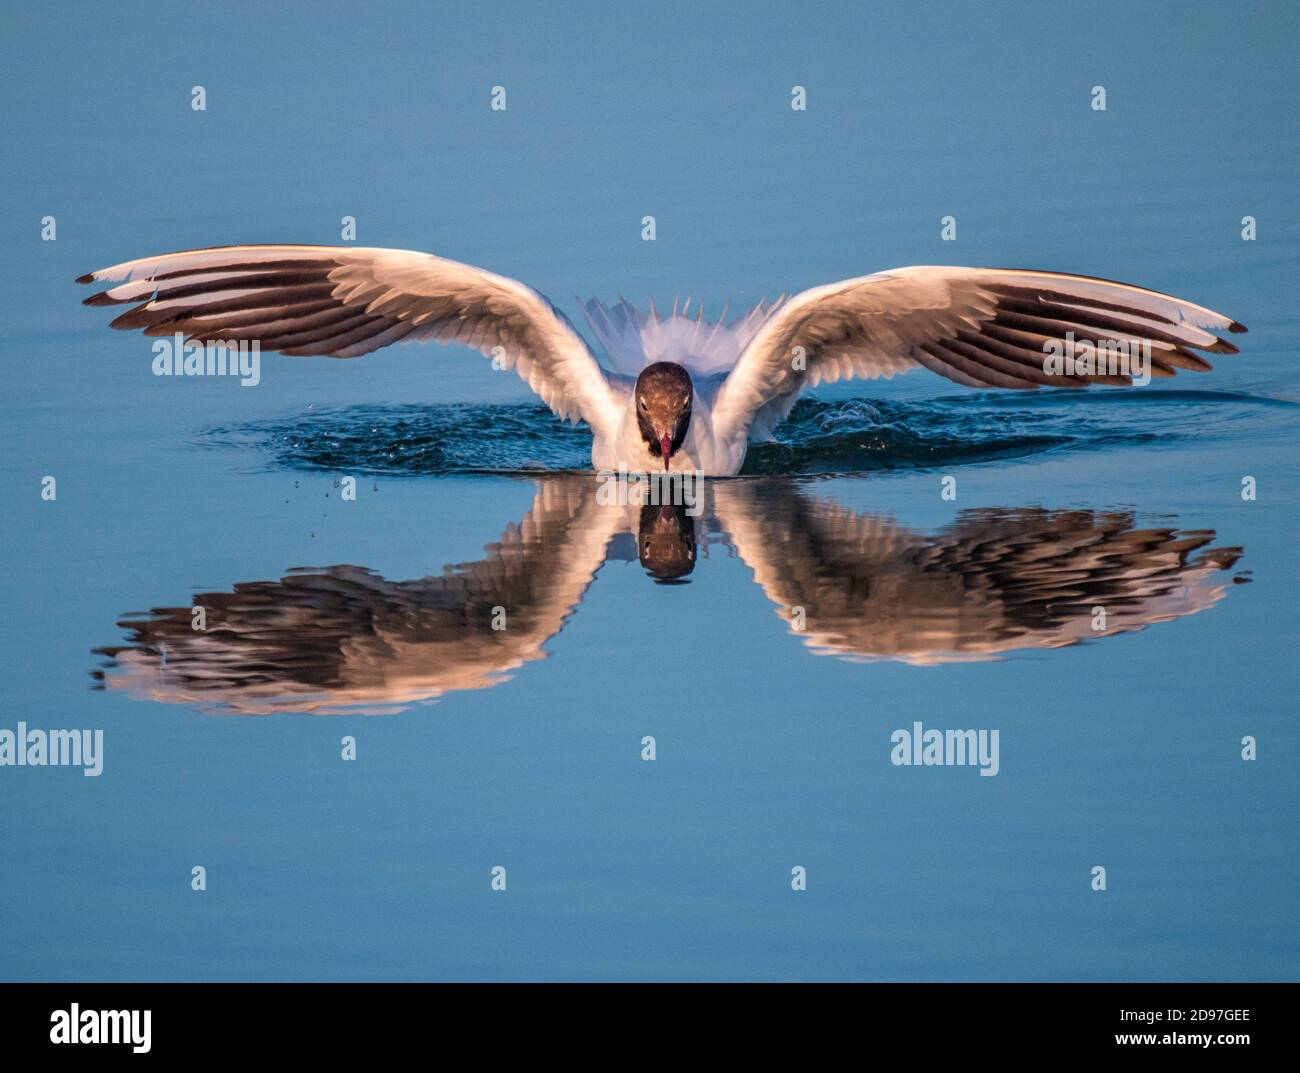 Black-headed Gull (Chroicocephalus ridibundus) landing on the water with its reflection, France Stock Photo